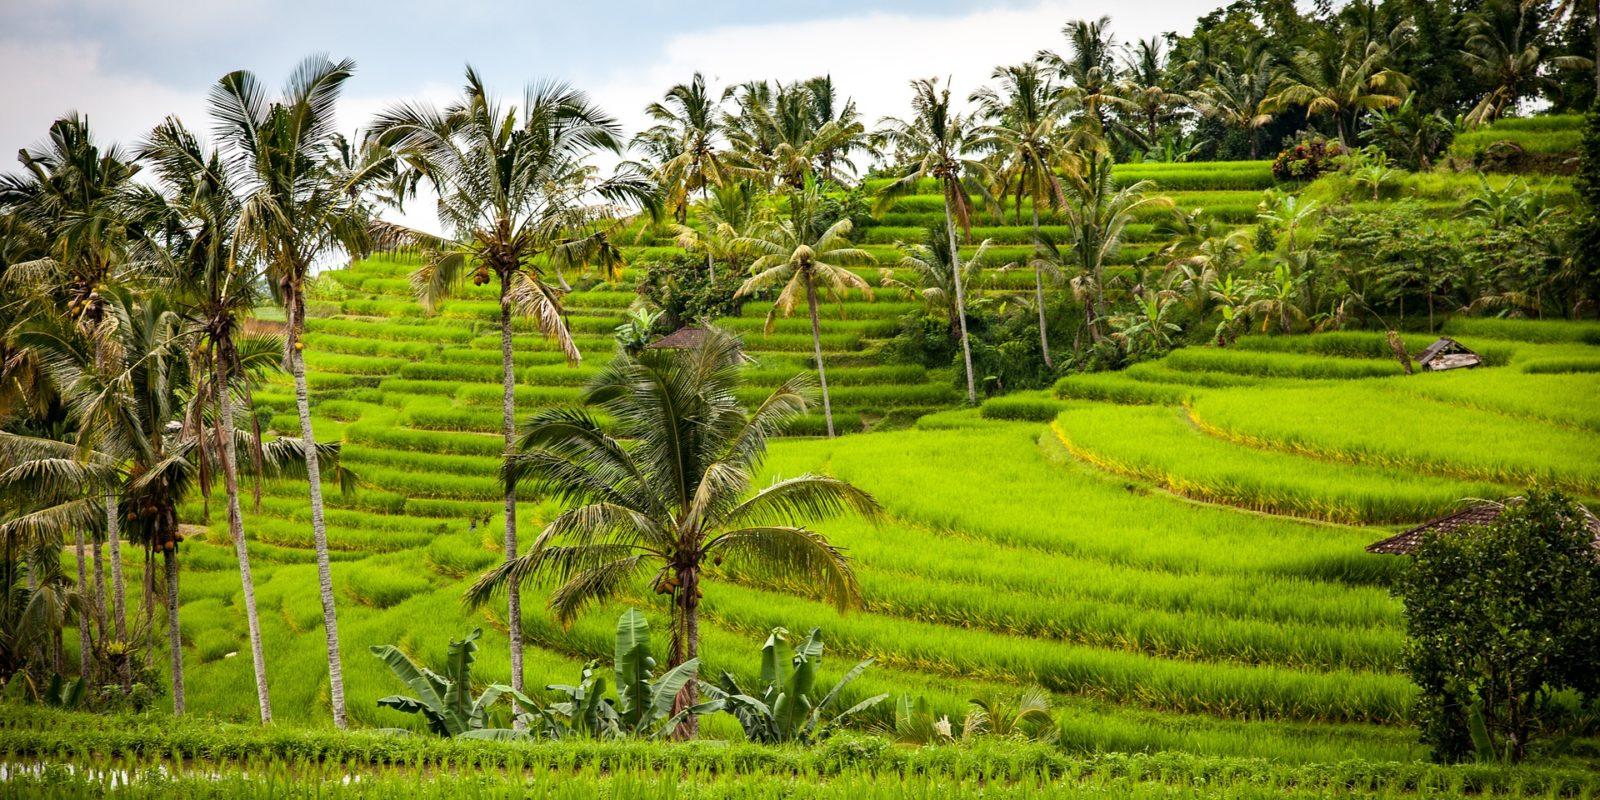 Stepped Paddy farming, Bali, Indonesia.